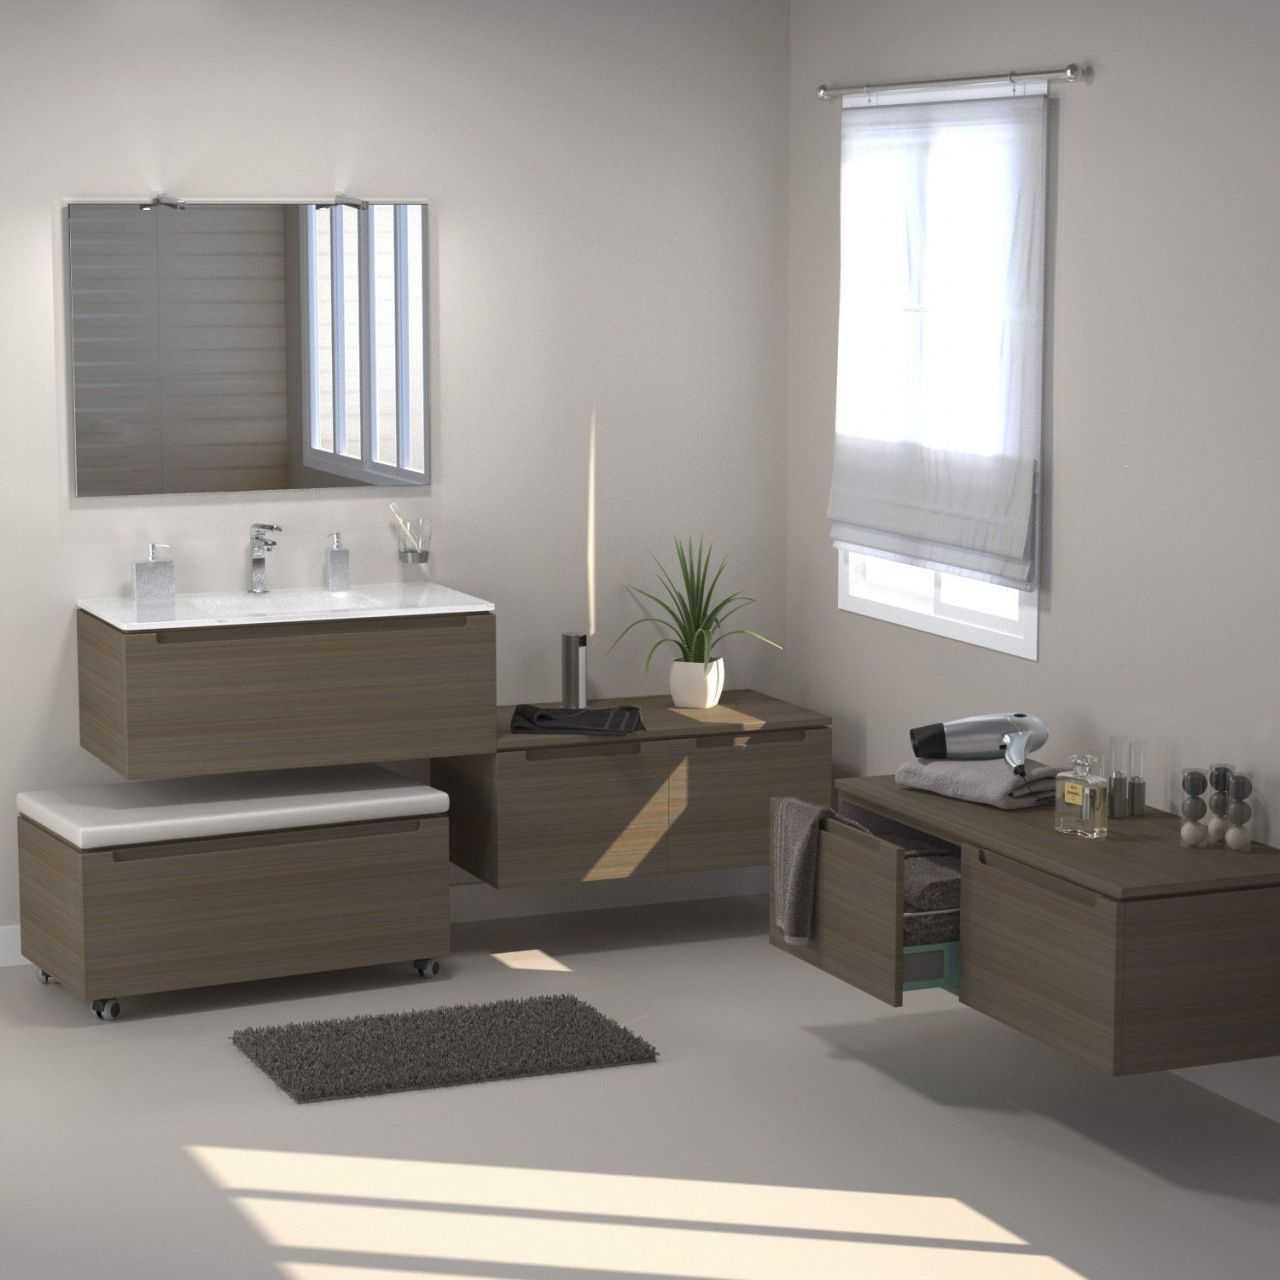 20 Leroy Merlin Salle De Bain Neo In 2020 Bathroom Remodel Designs Bathroom Decor Bathrooms Remodel